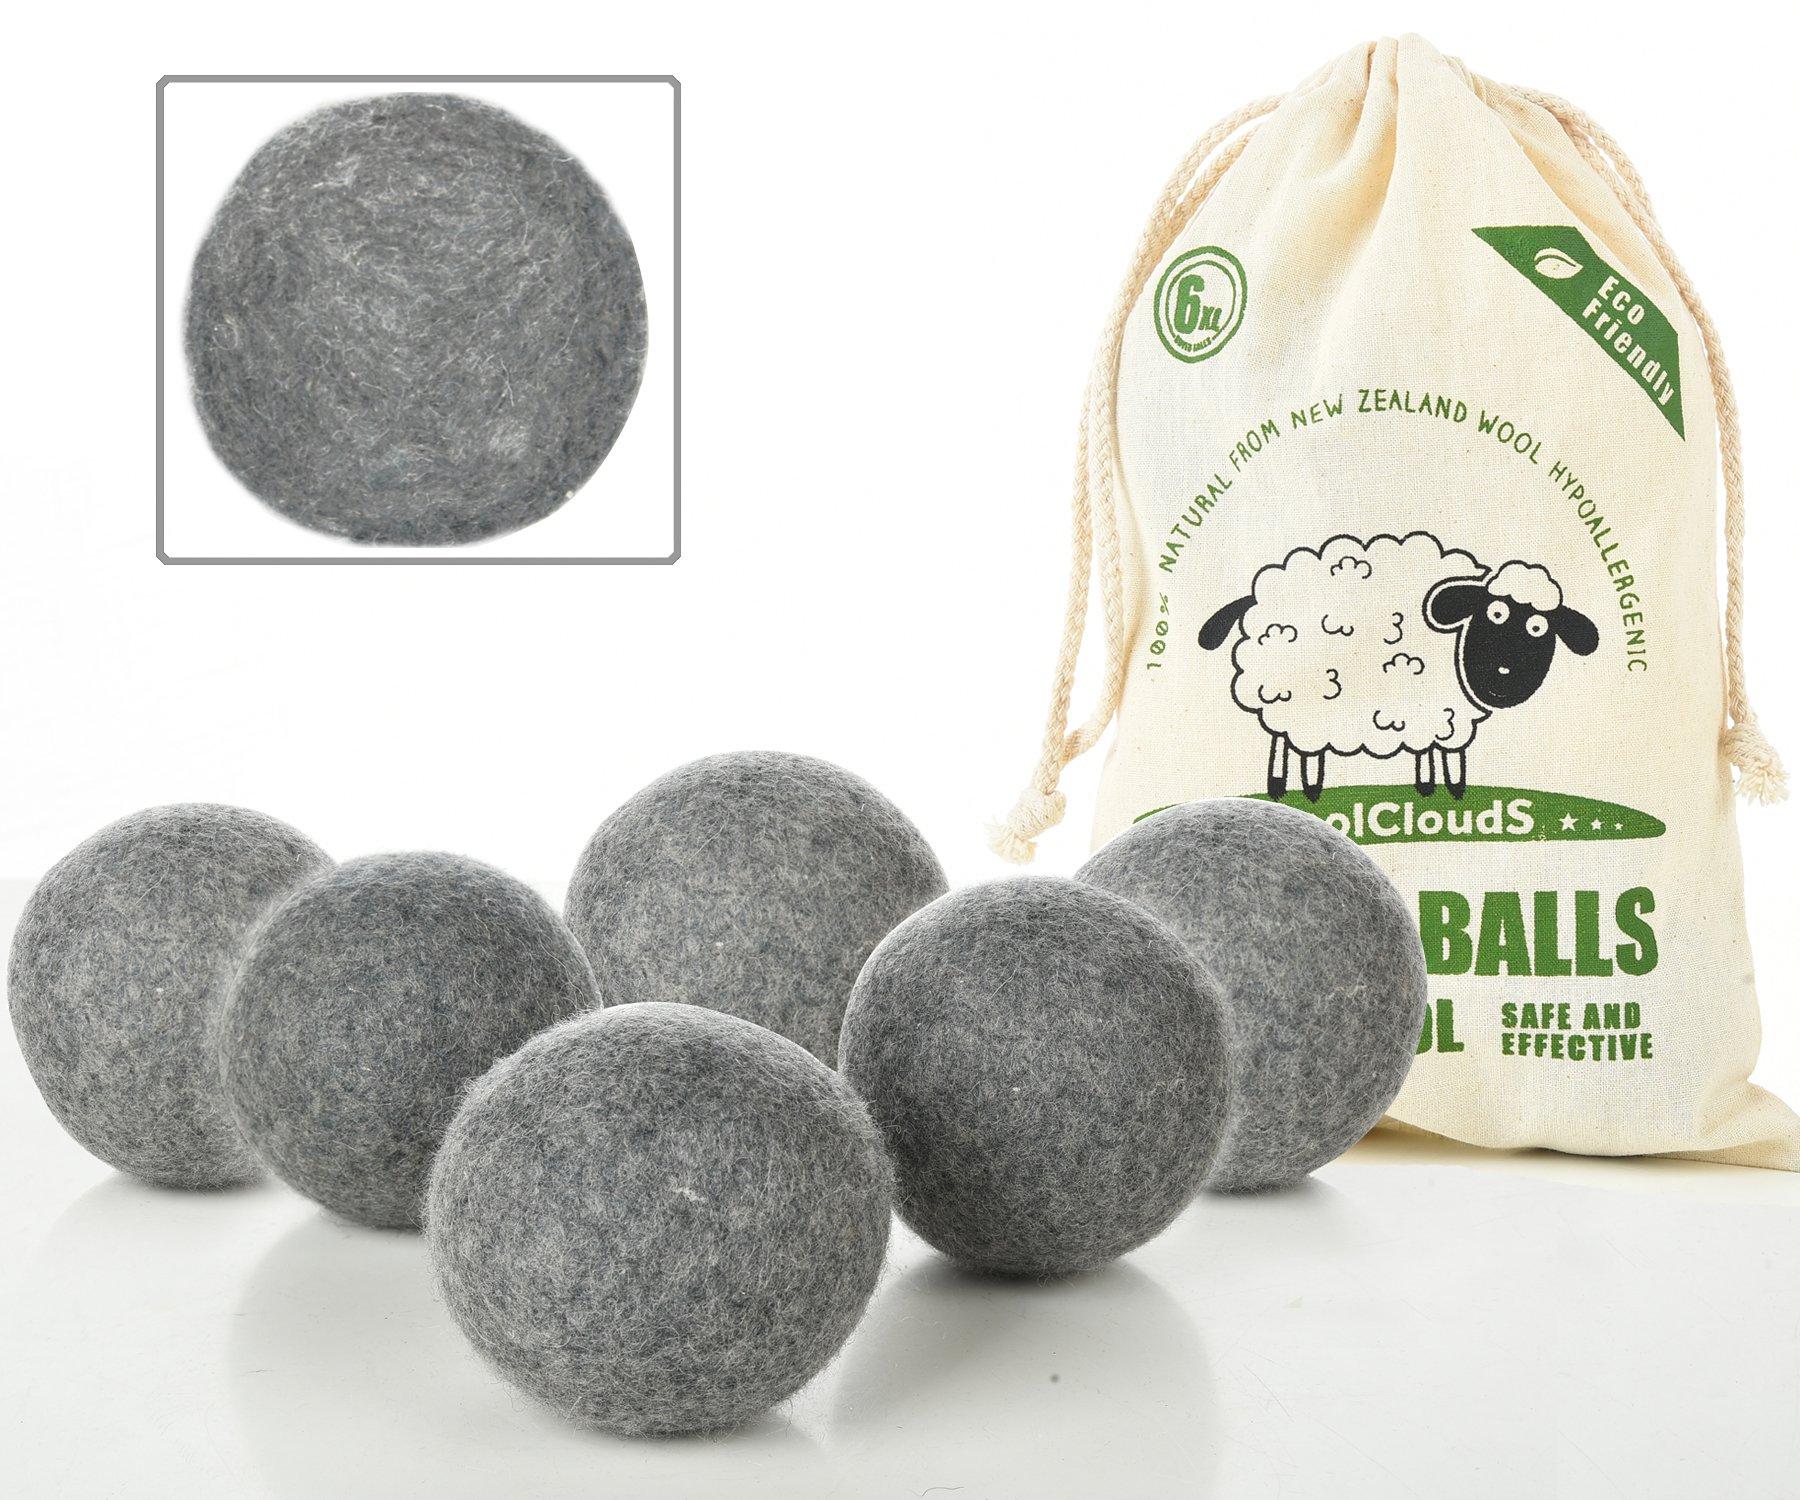 Fabric Laundry Hamper Nz: Amazon.com: Dryer Balls Laundry, Wool Dryer Balls For